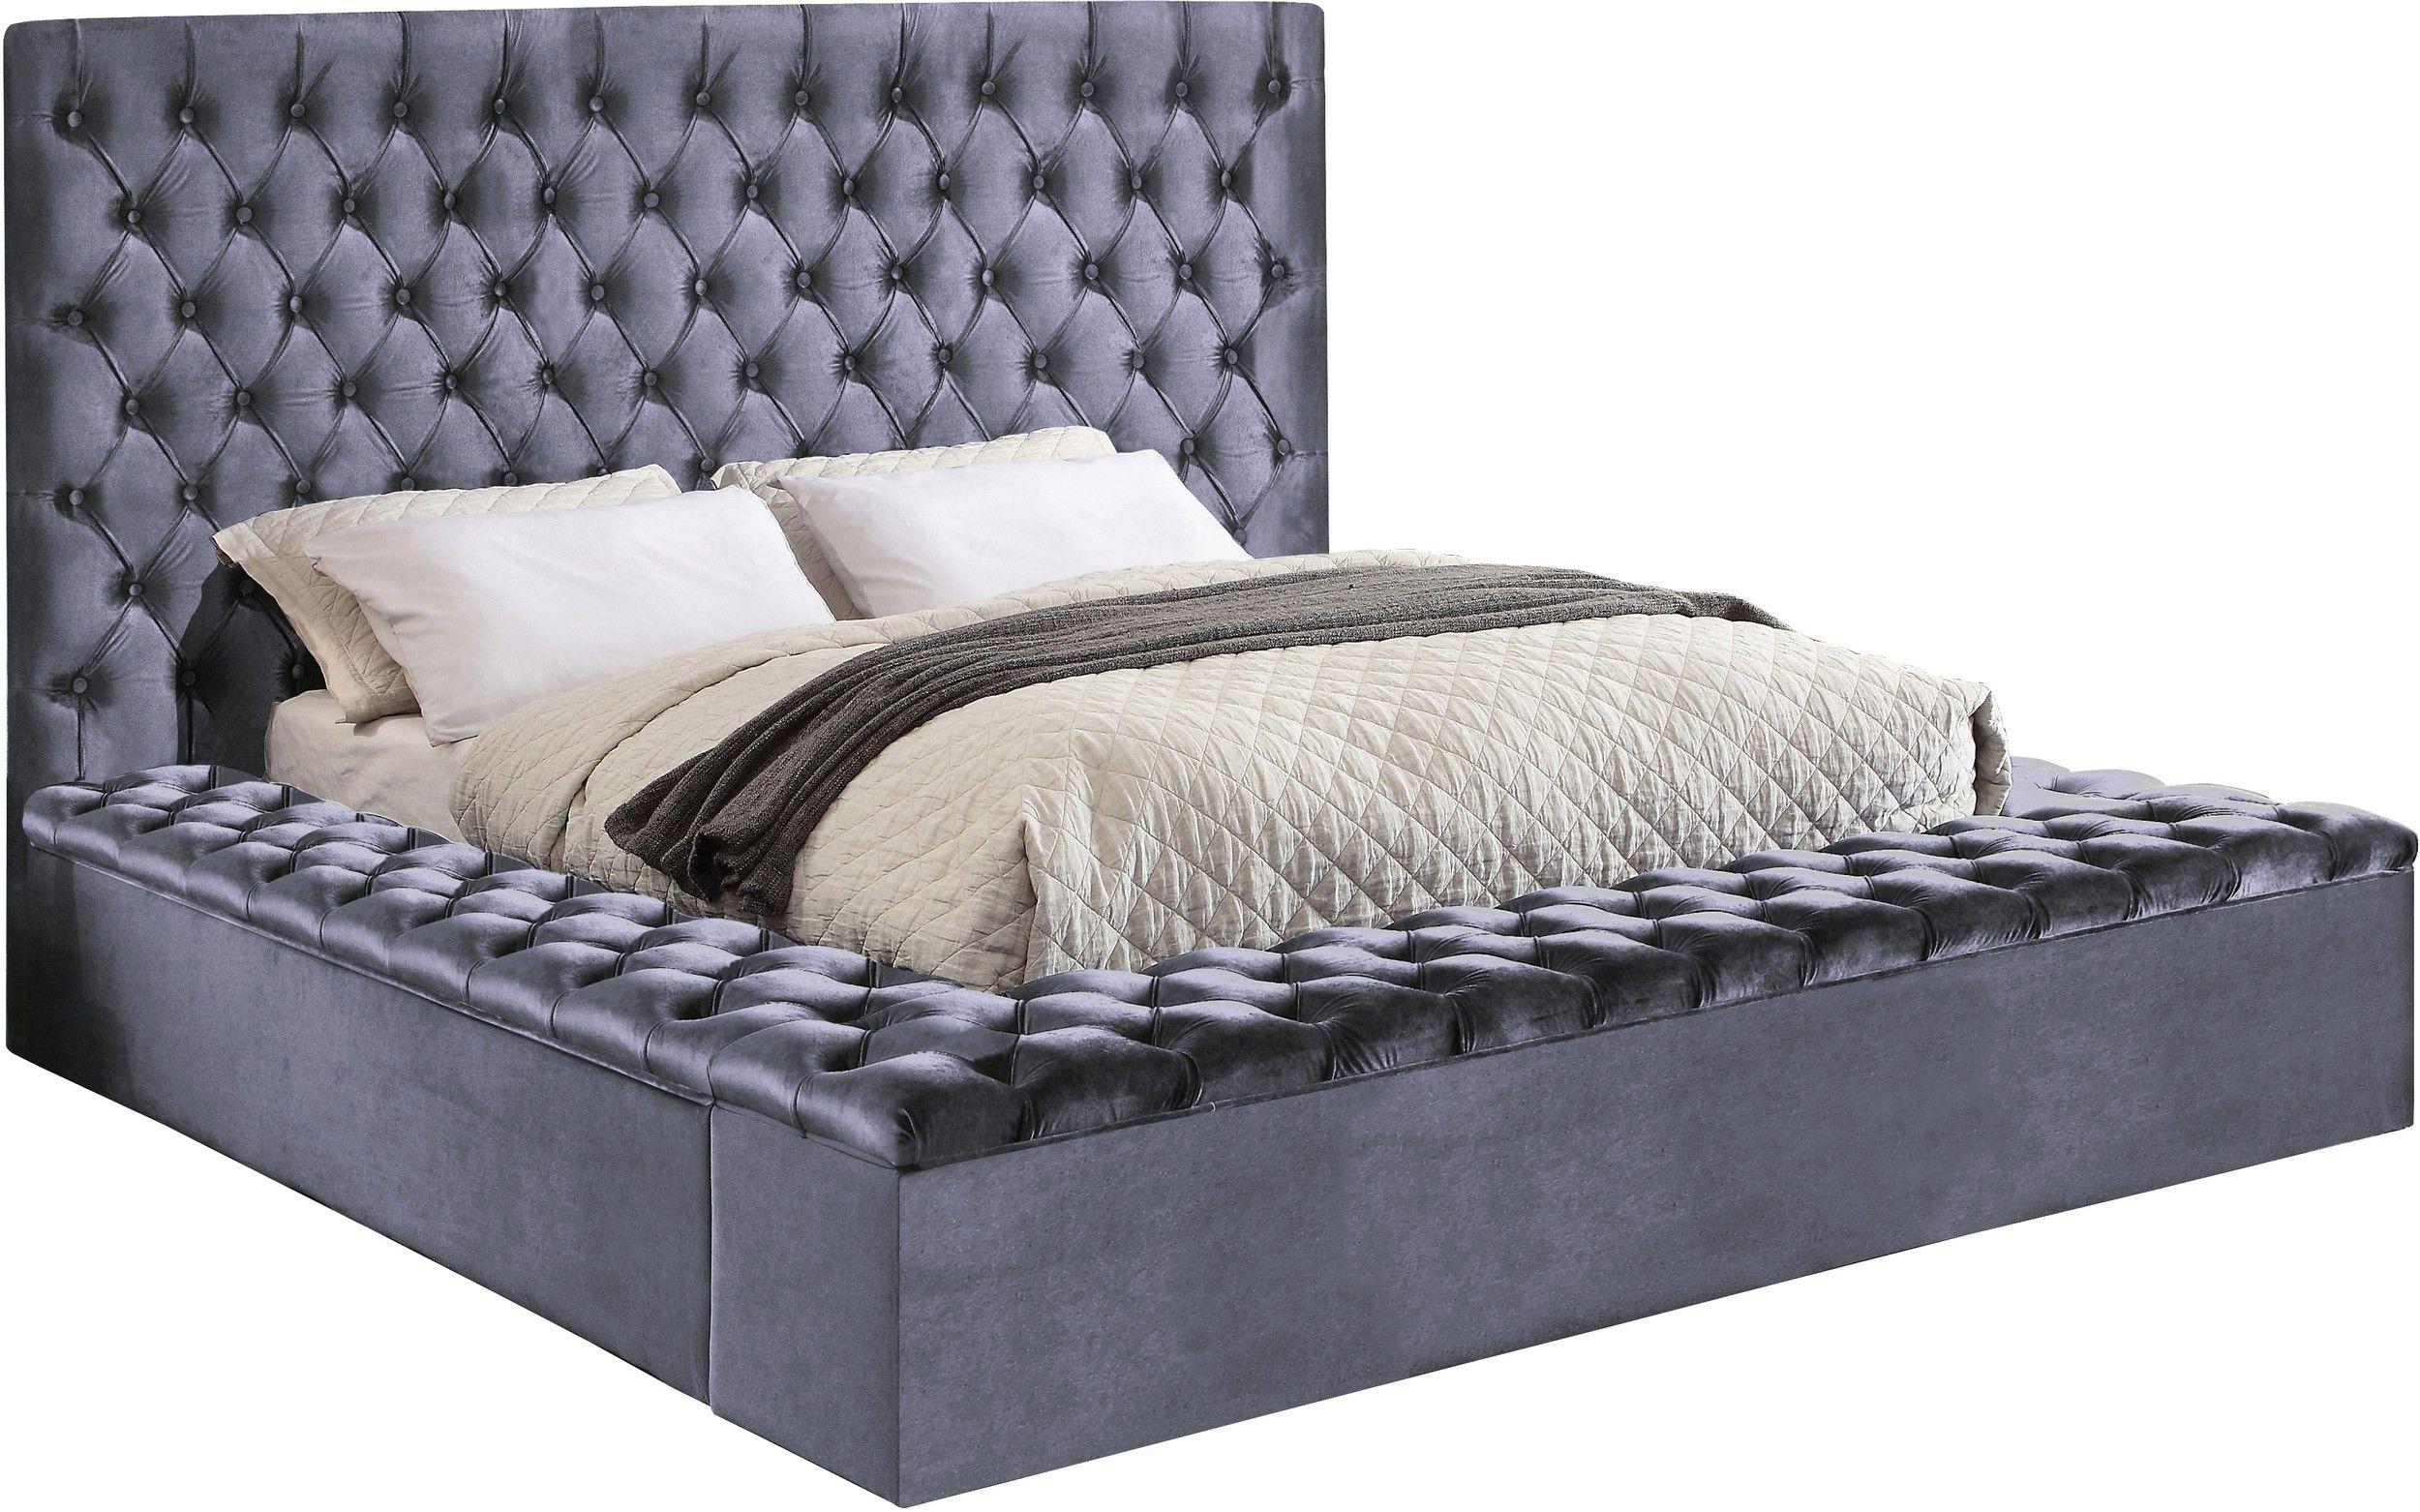 Lowest Price On Meridian Bliss Grey Velvet King Storage Bed Blissgrey K Shop Today Velvet Upholstered Bed Upholstered Beds Modern Bed